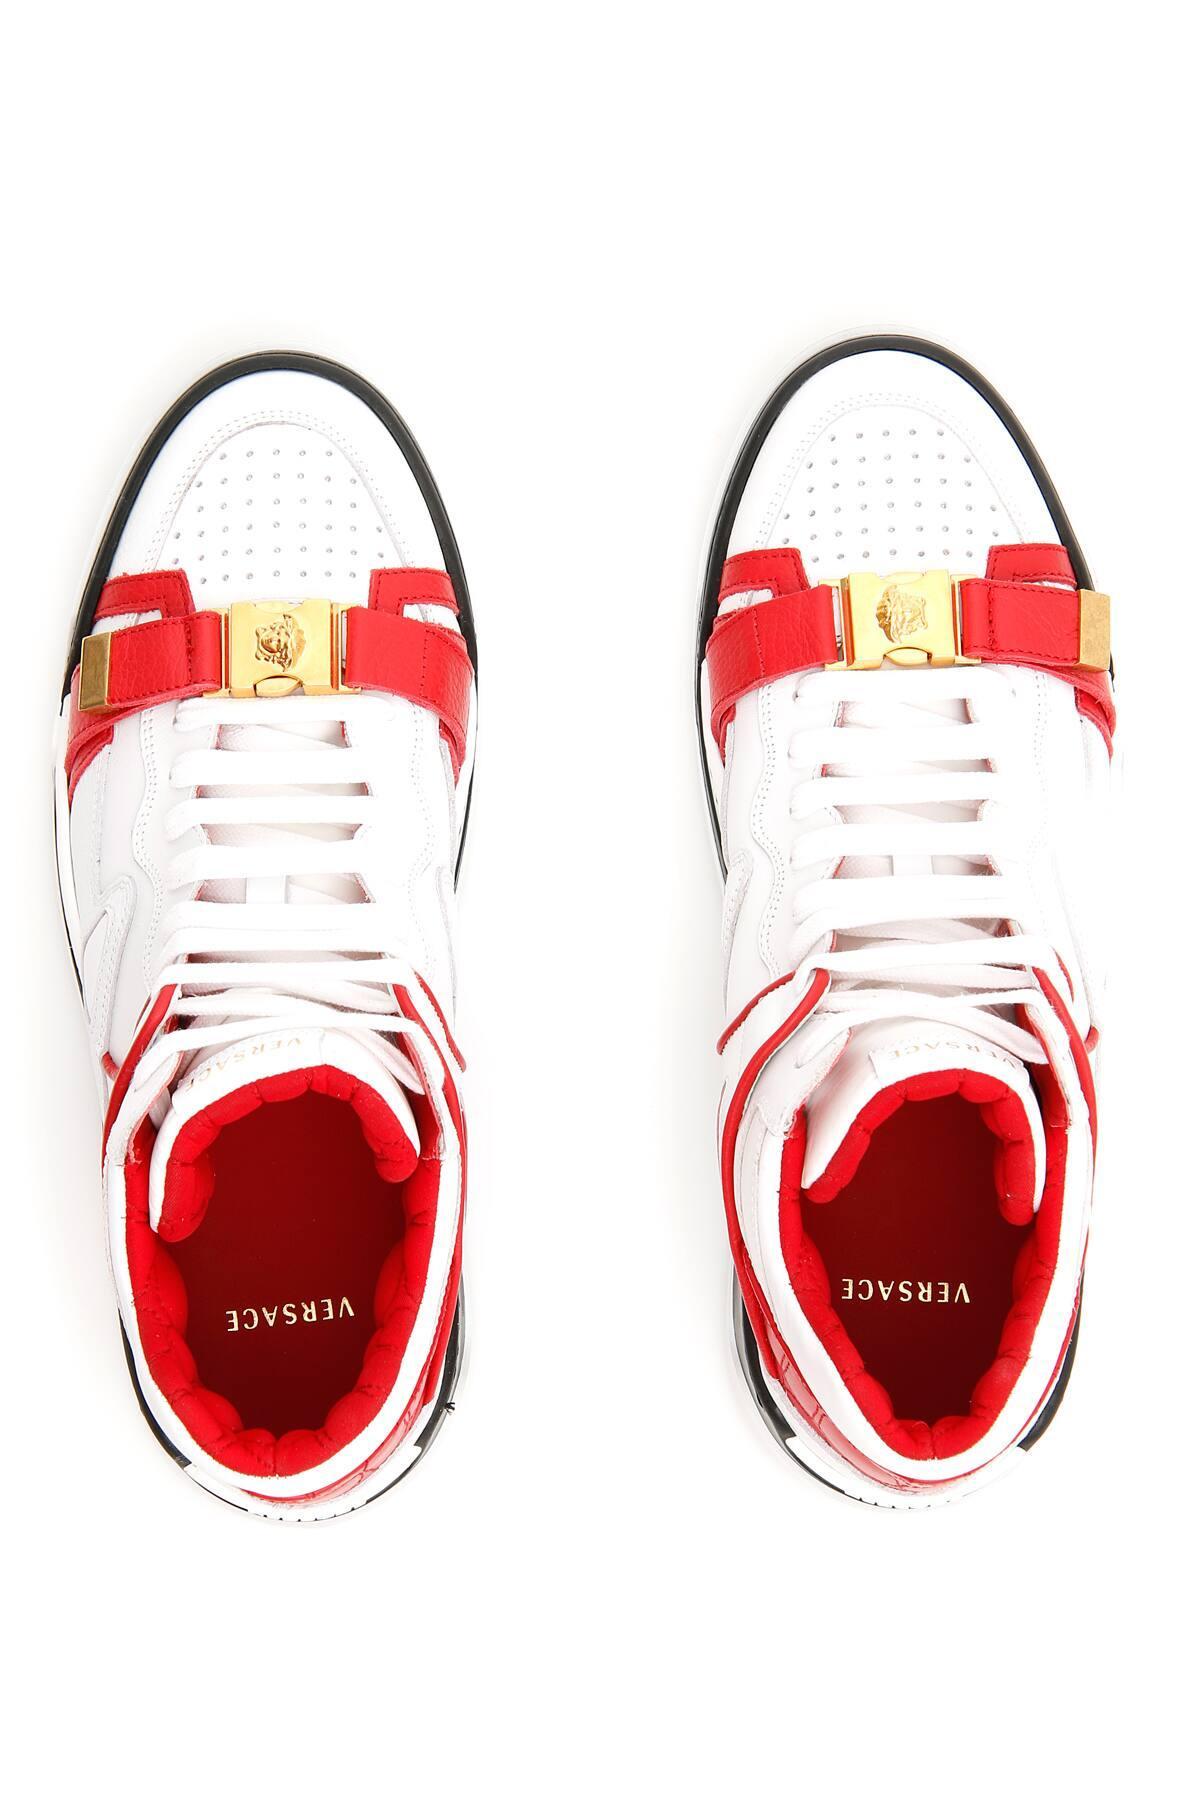 Versace Atlas Sneaker in Red for Men - Lyst